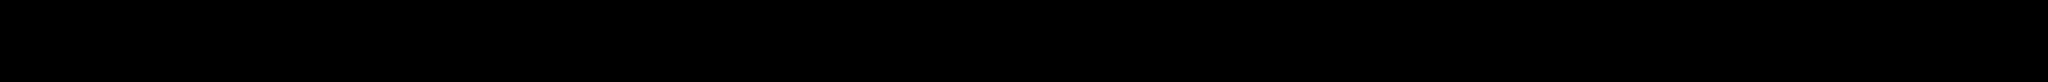 DENSO 76630-TF0-G01, 98360-2W100, 98360-A5000, 98360-A2000, 38340-61M30 Törlőlapát